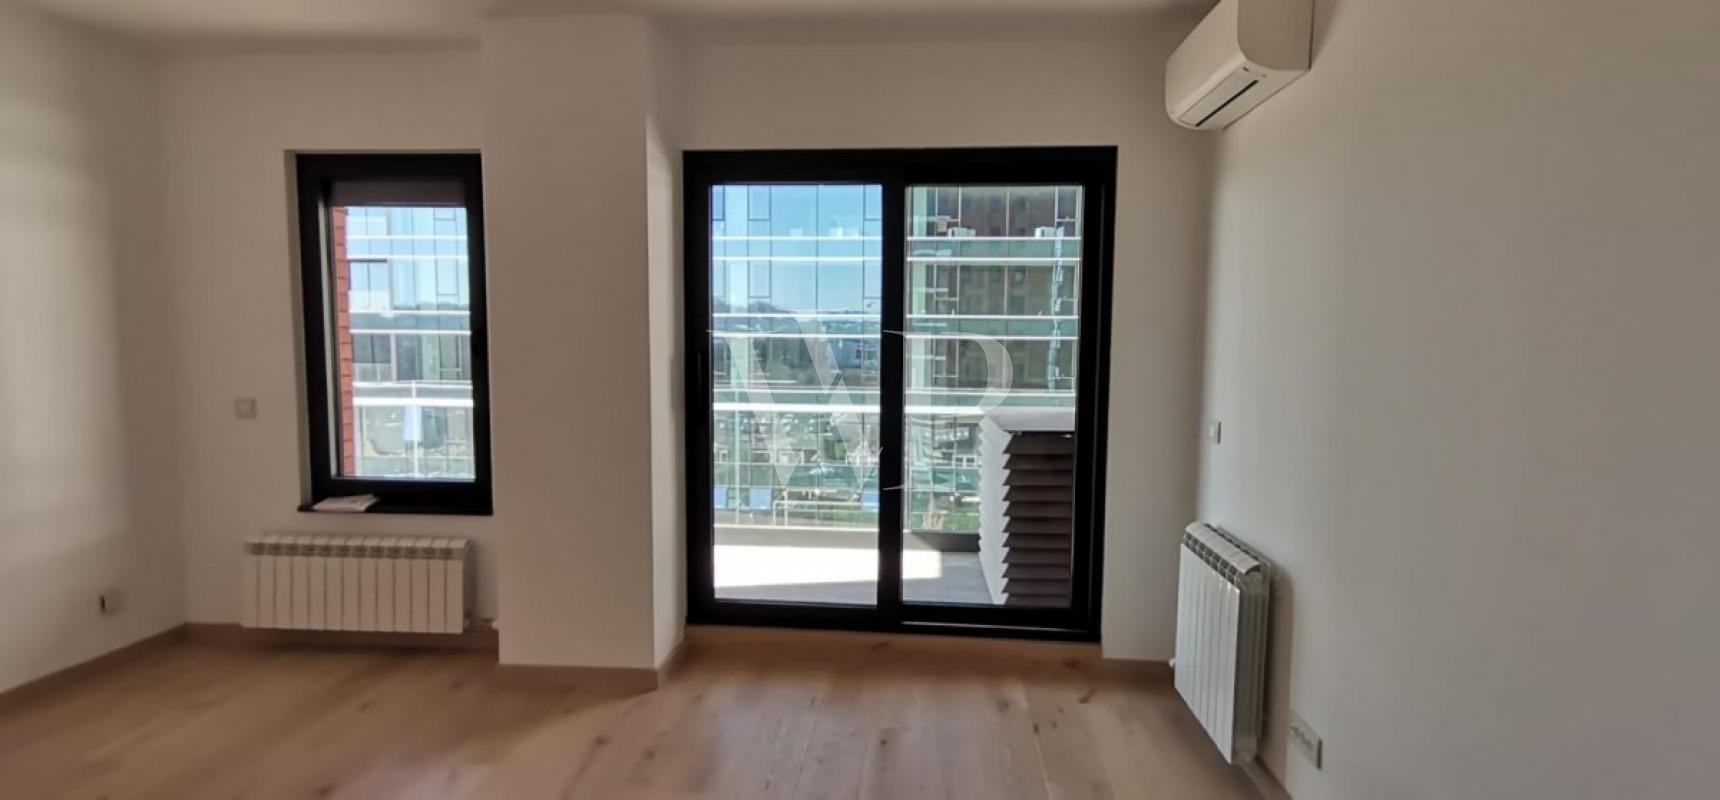 Novi Beograd, Blok 43, Bulevar Milutina Milankovića, 2.5, 74.00m2, 750 EUR